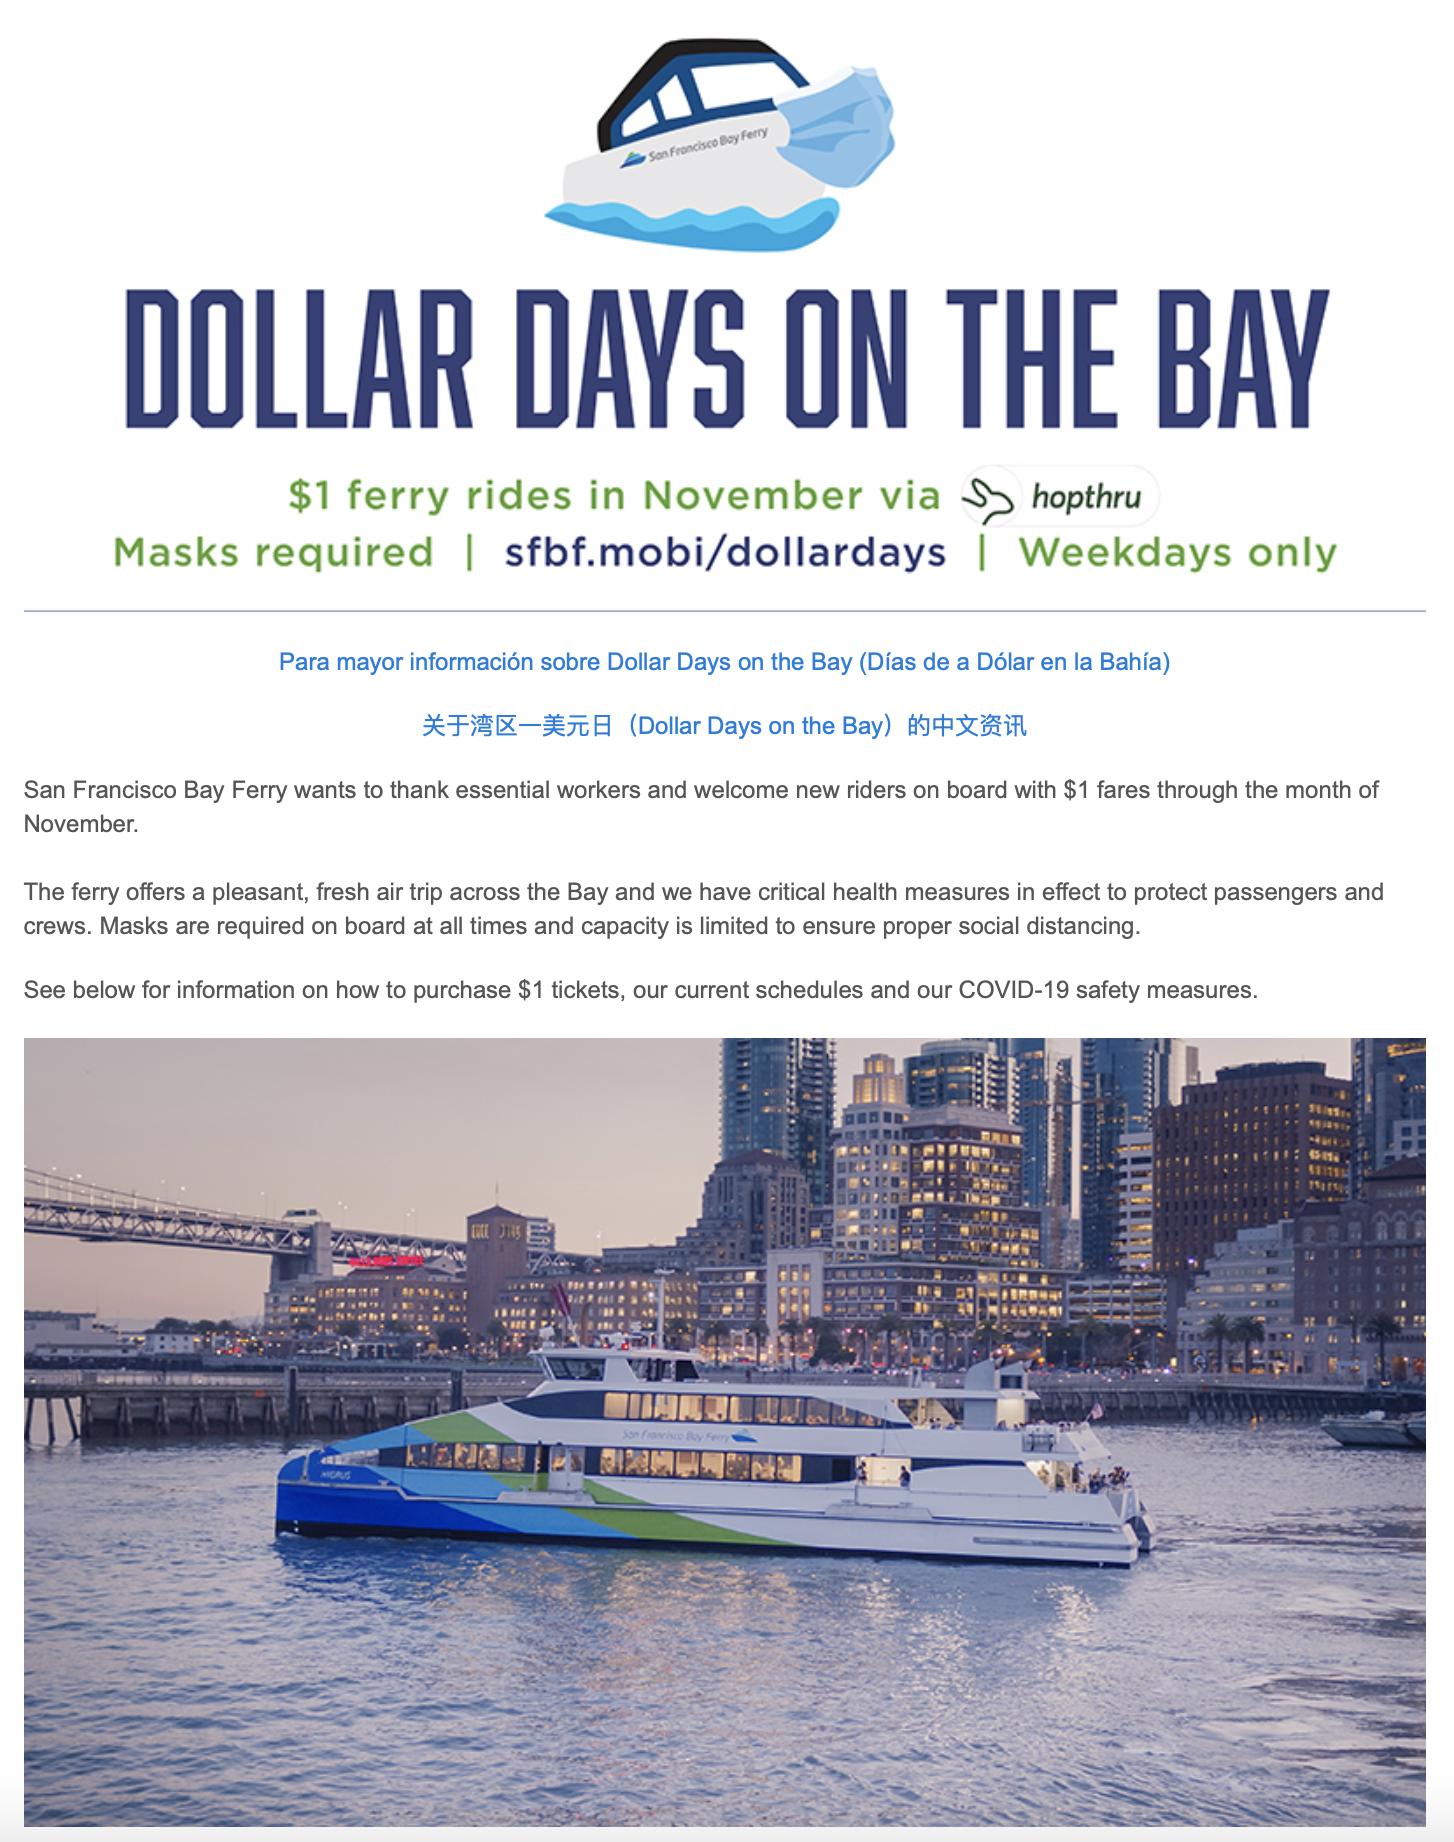 Dollar Days On The Bay Vallejo Bay Ferry